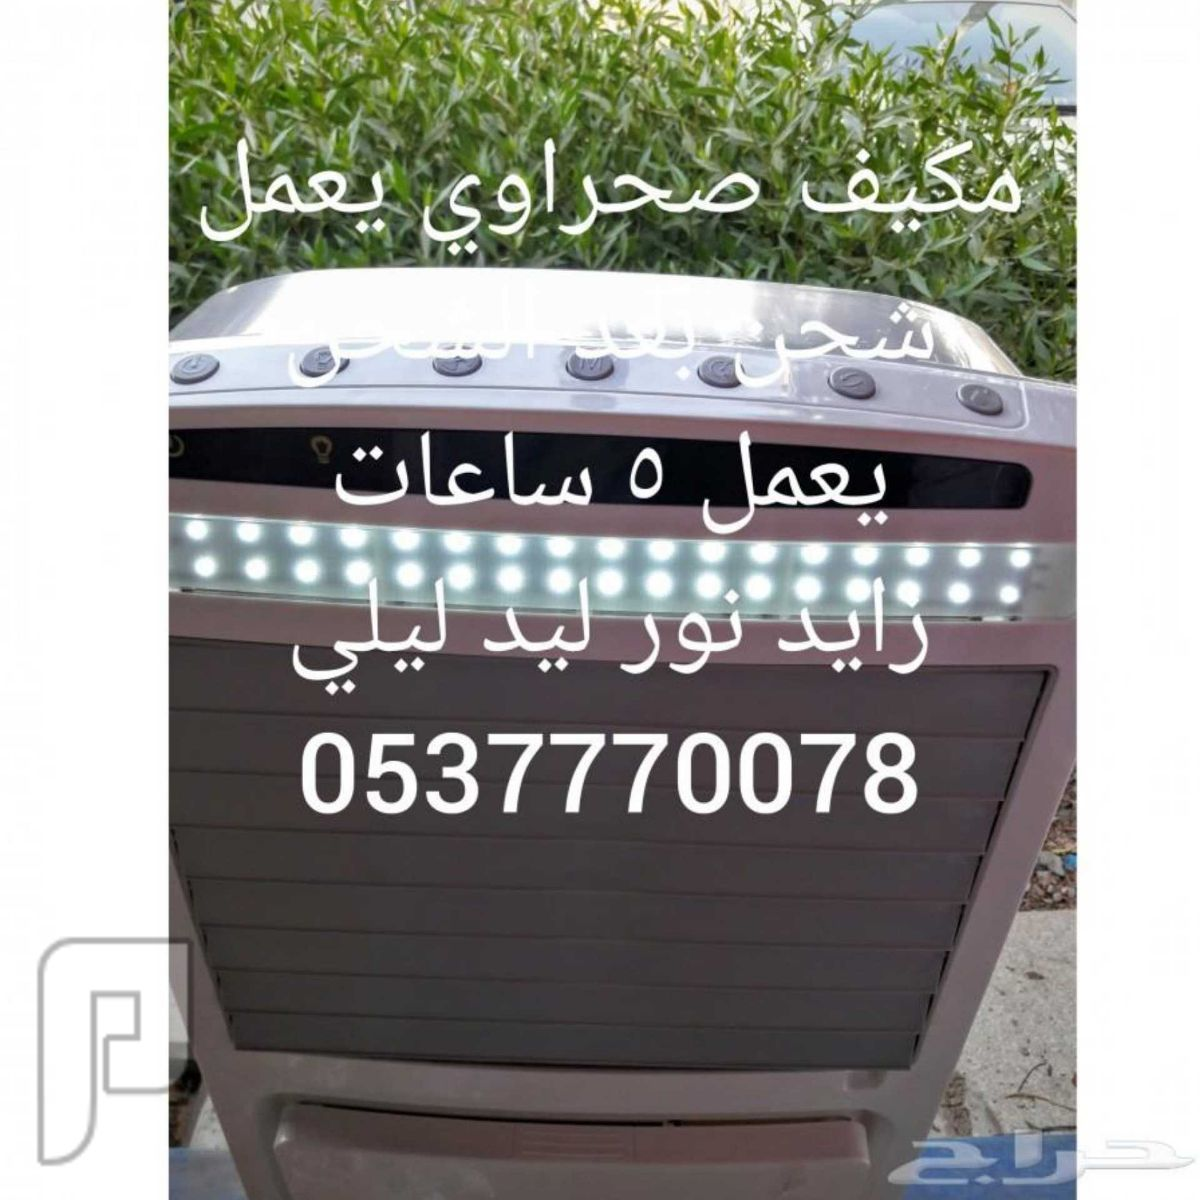 مكيف صحراوي شحن كهرباء جديده مكيف صحراوي شحن كهرباء